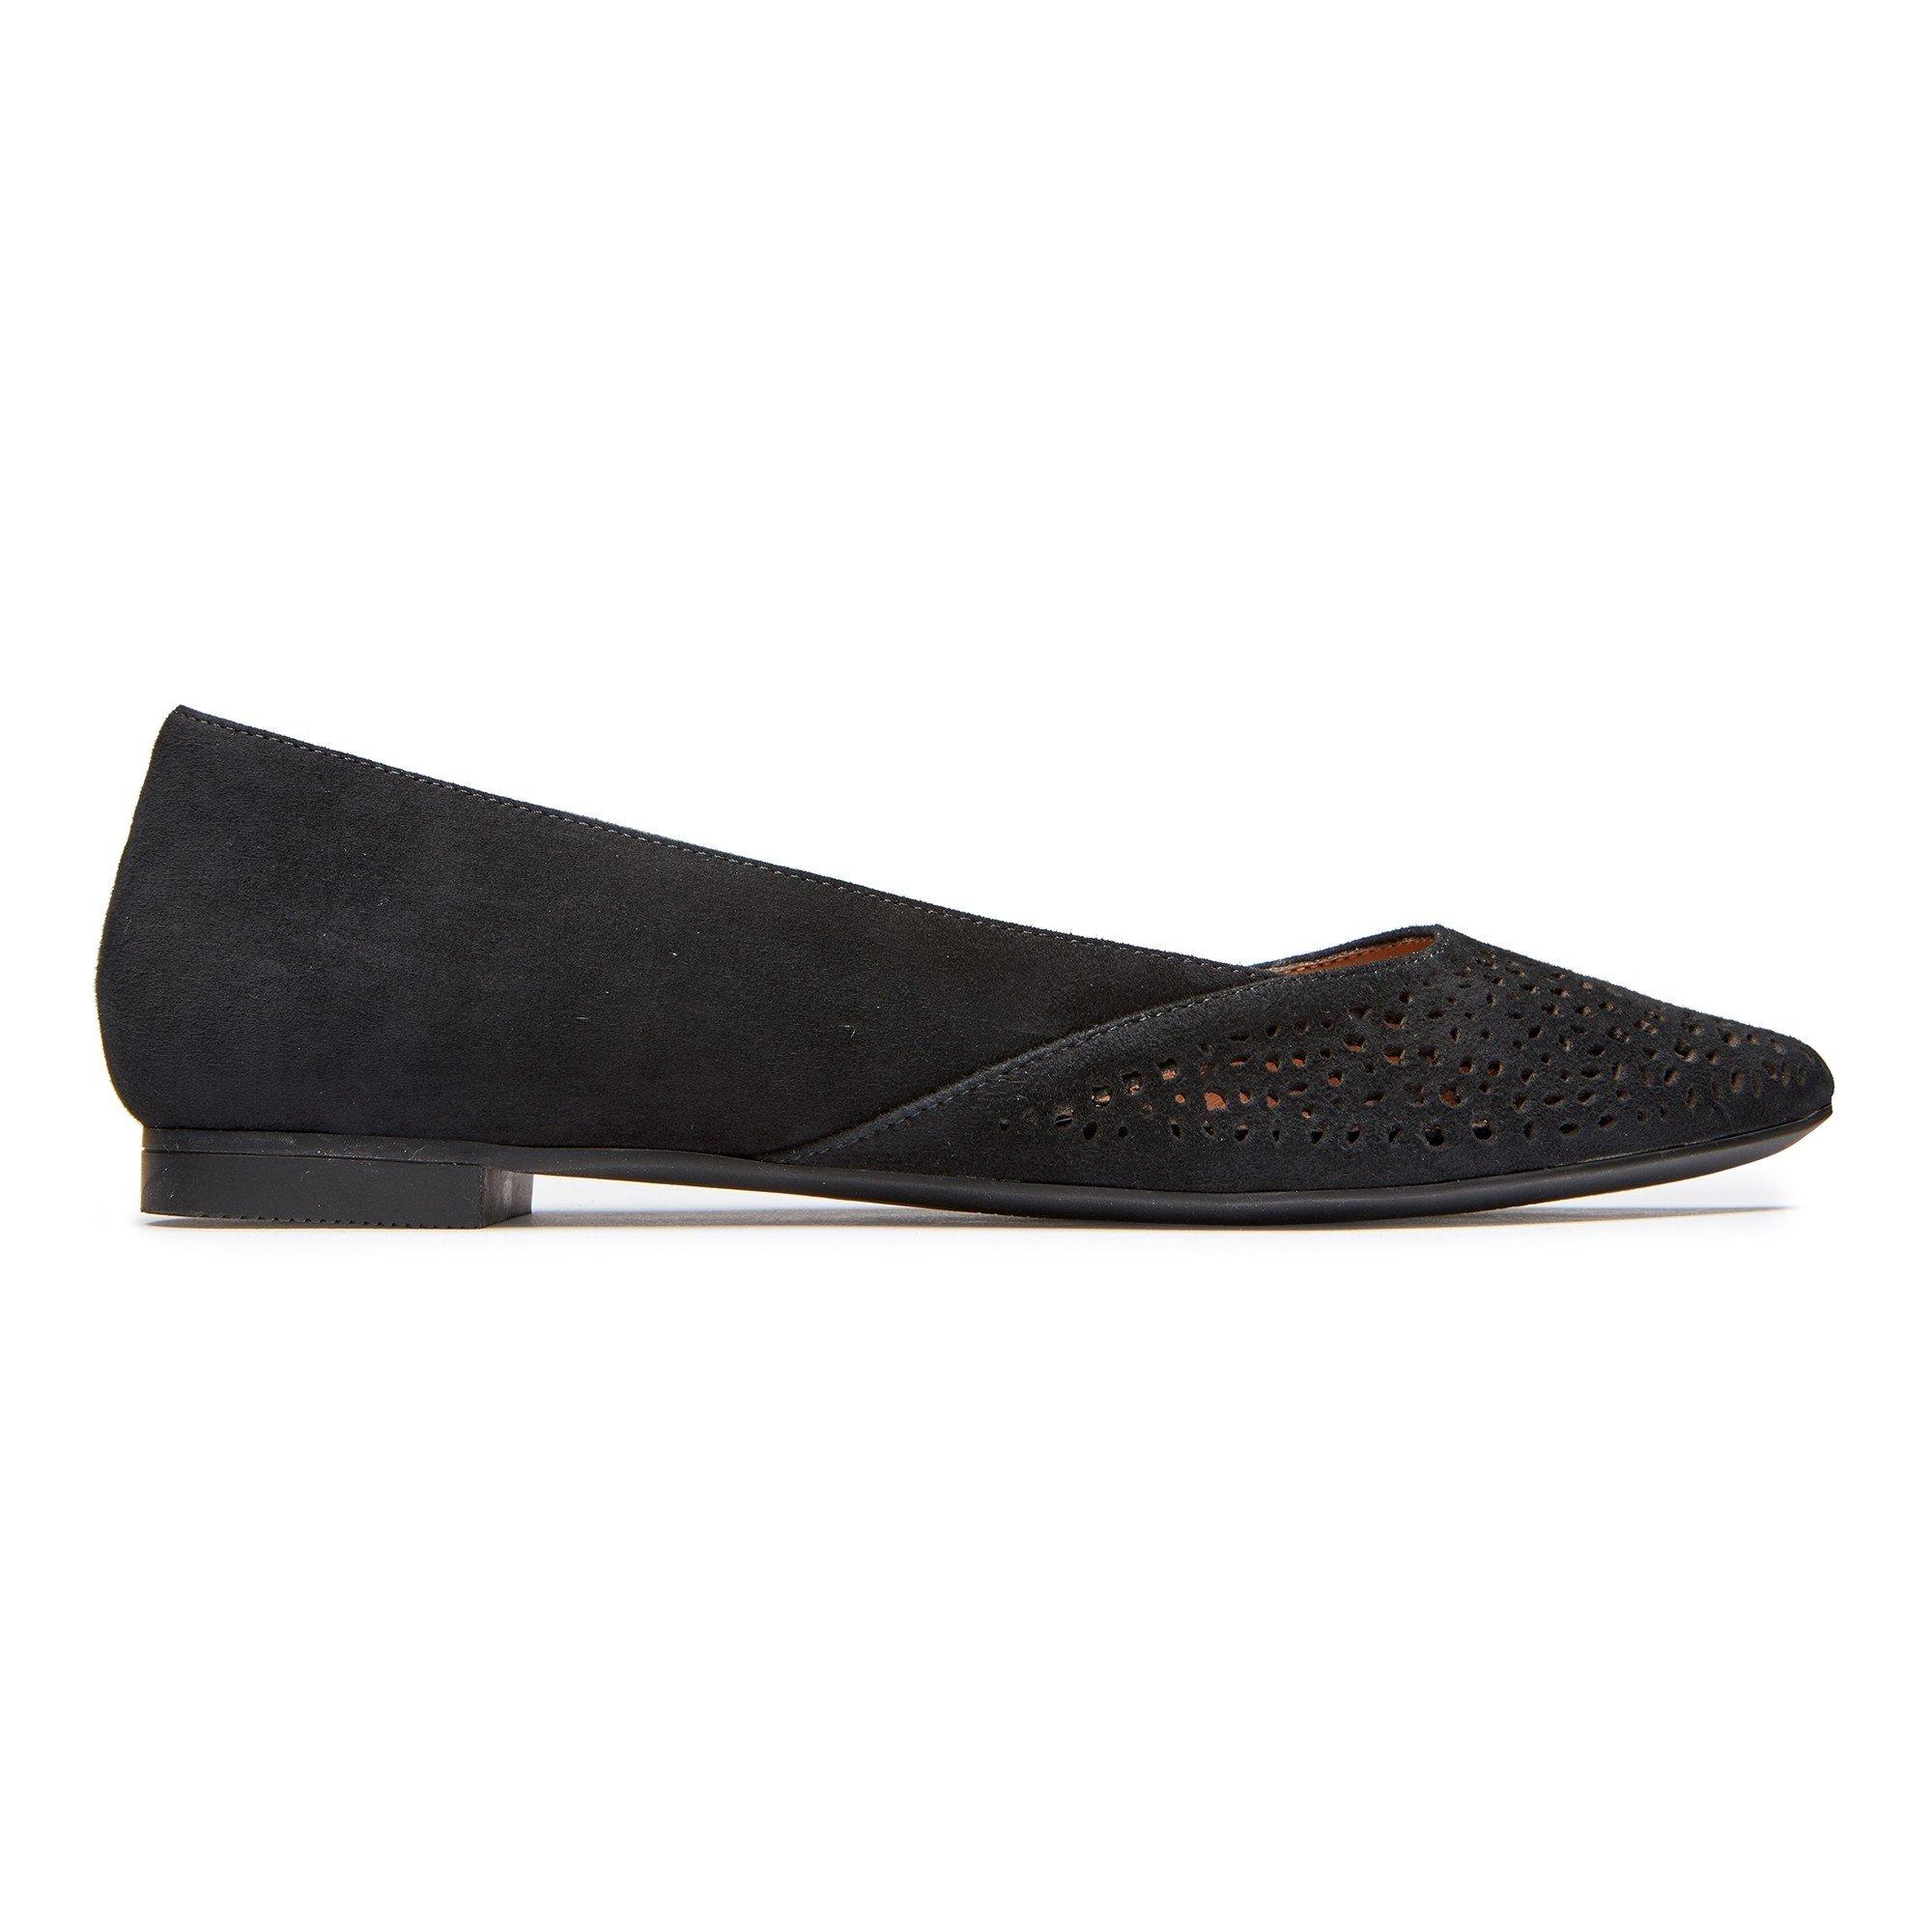 Giày Búp Bê Nữ VIONIC W Carmela Perf Sude